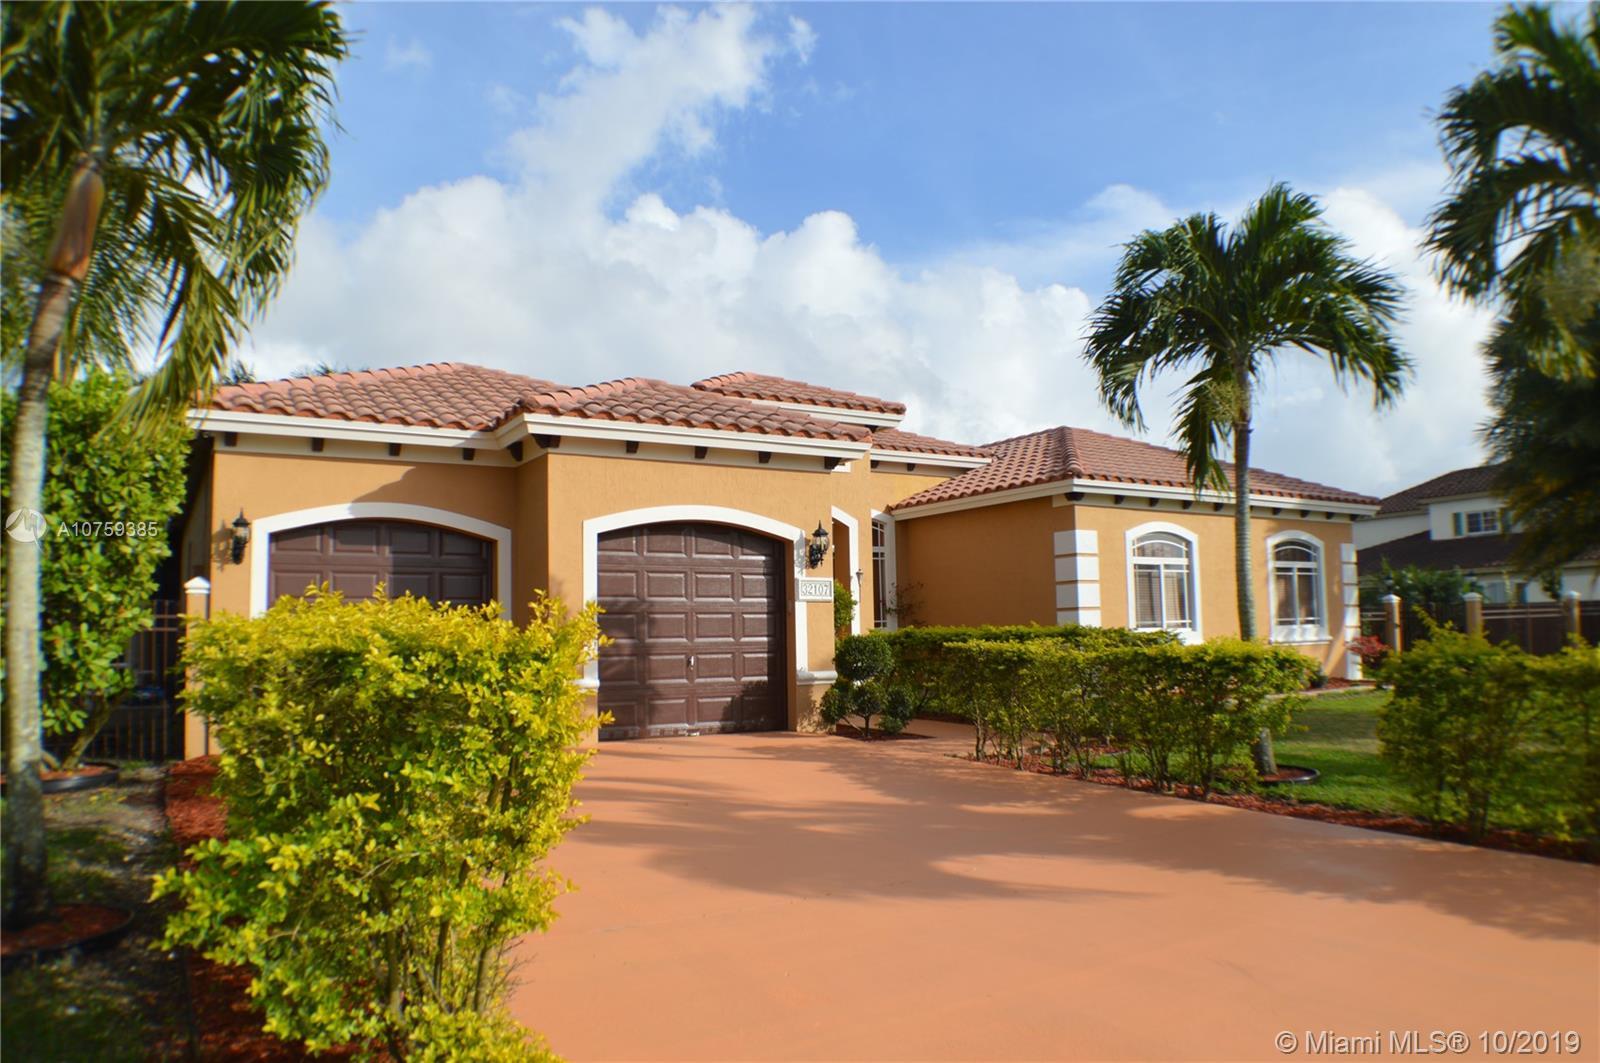 32107 SW 207th Ave, Homestead, FL 33030 - Homestead, FL real estate listing